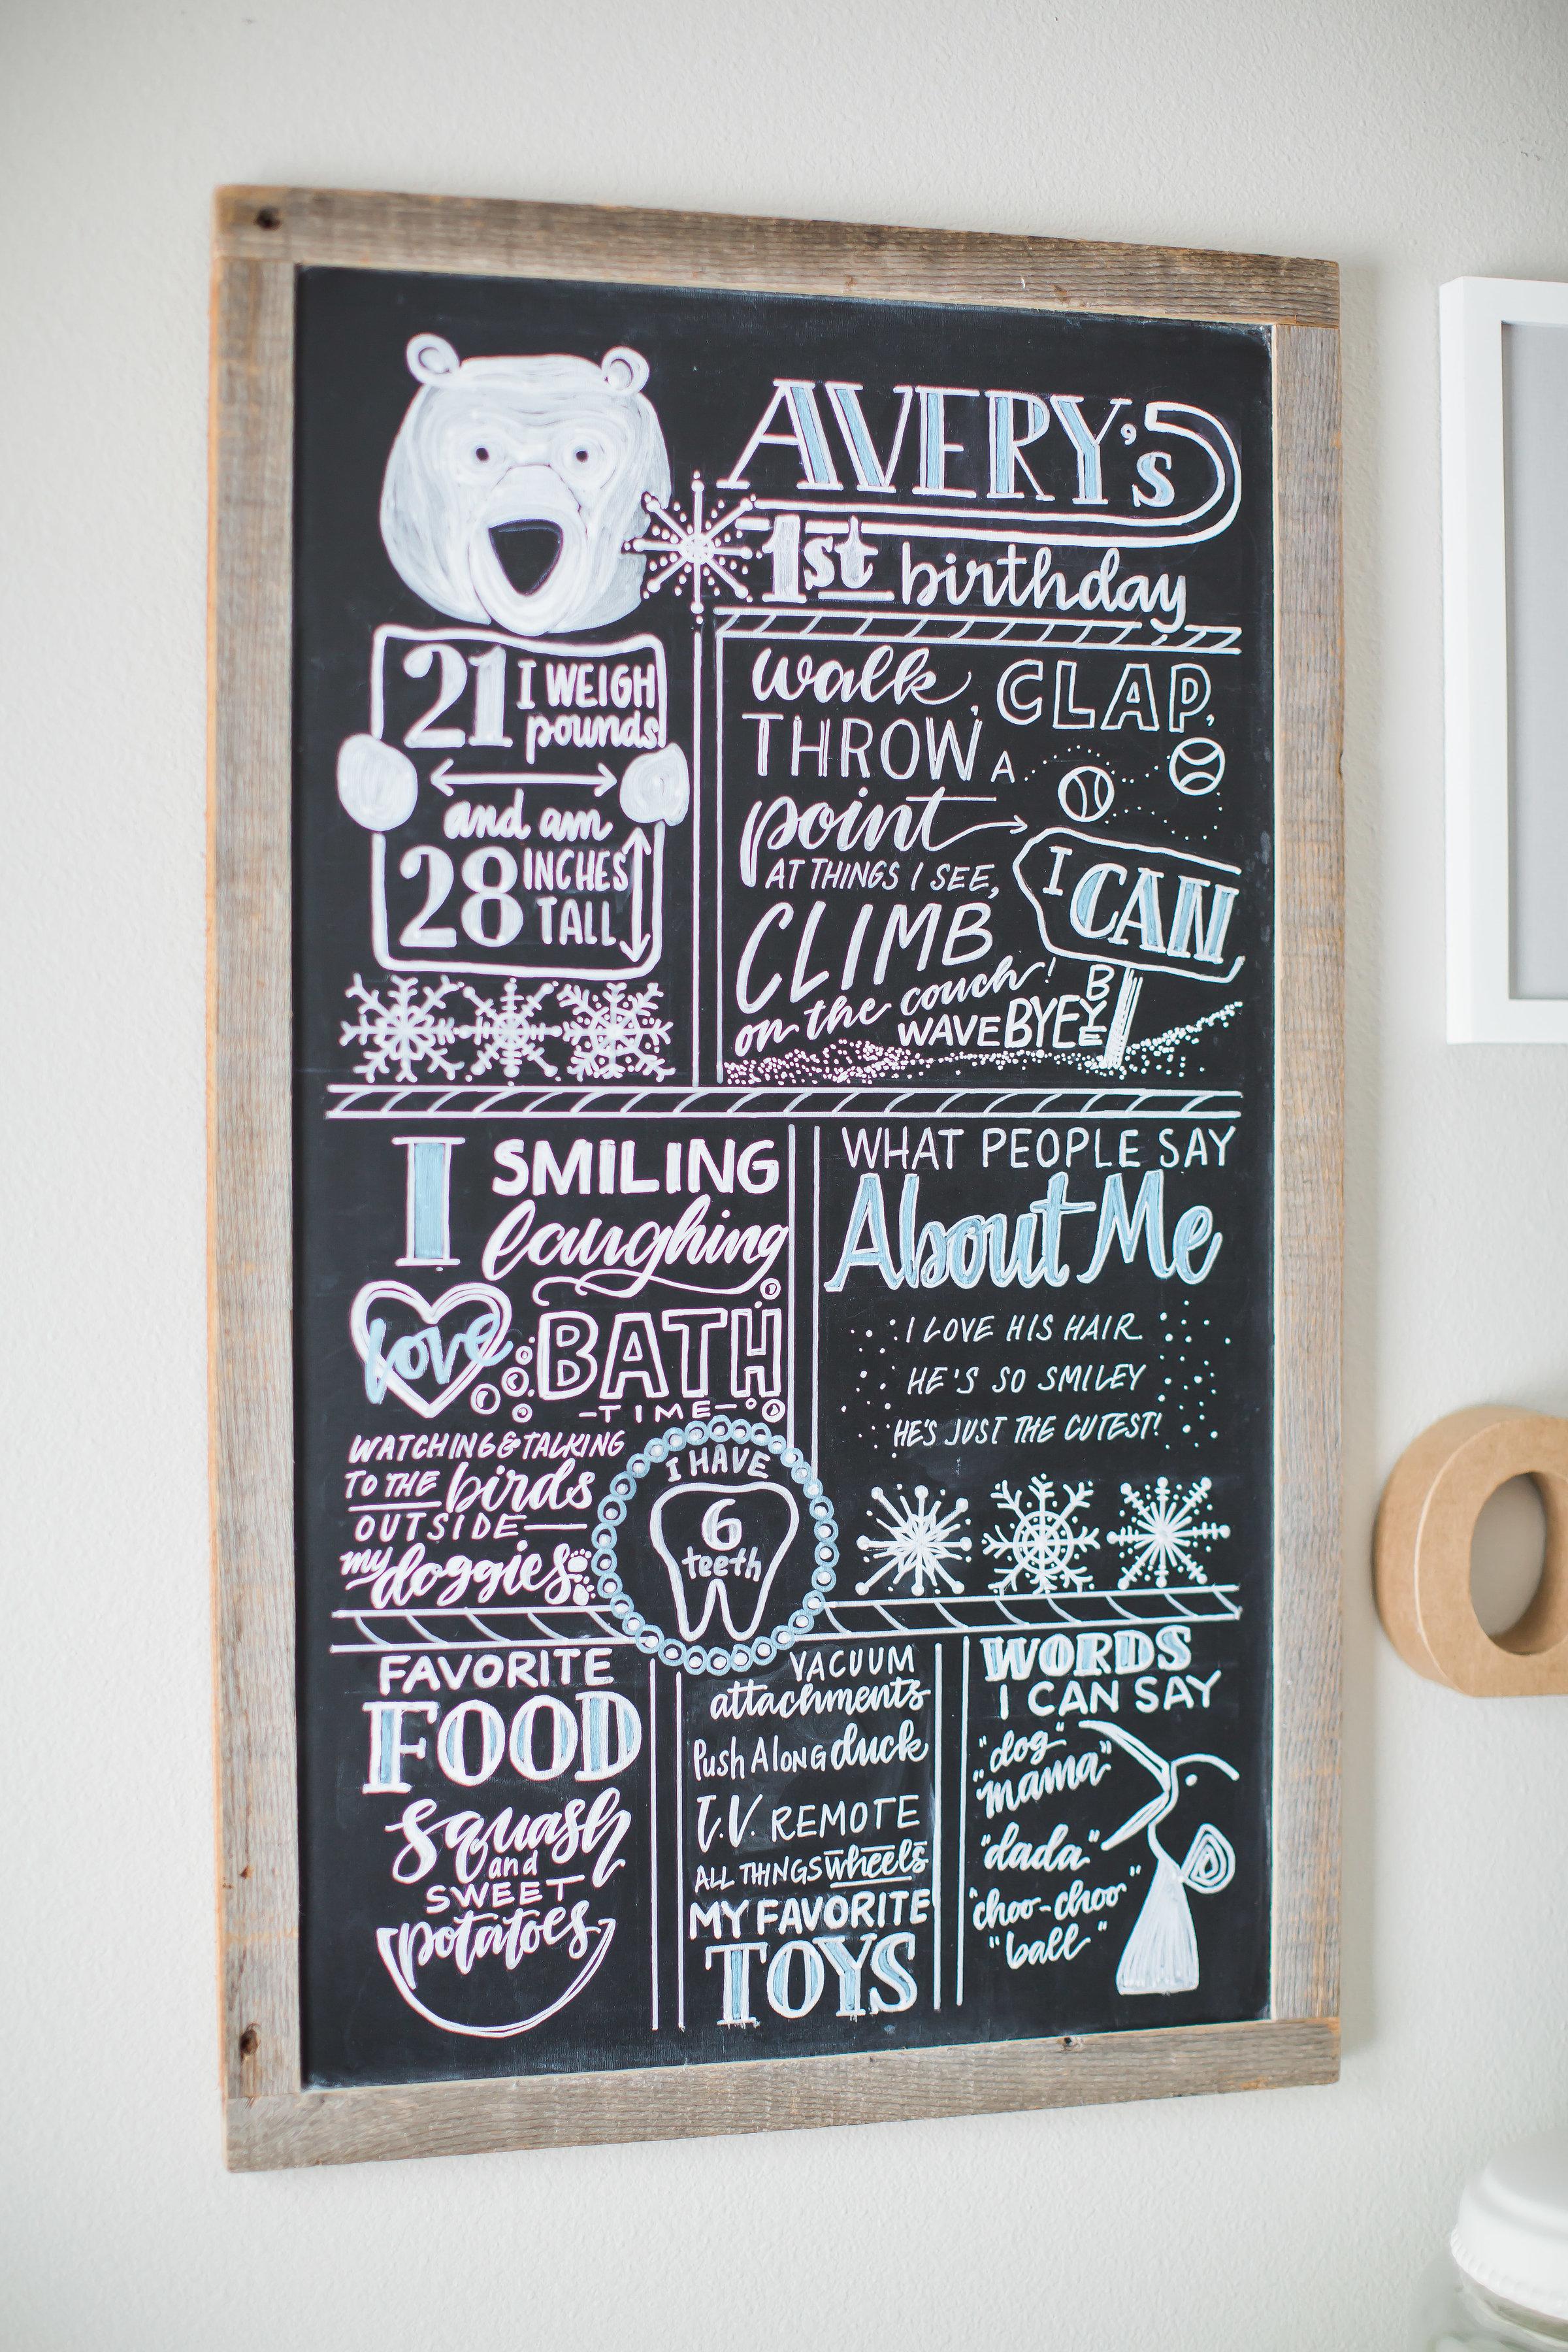 Avery1stBirthday-12.jpg